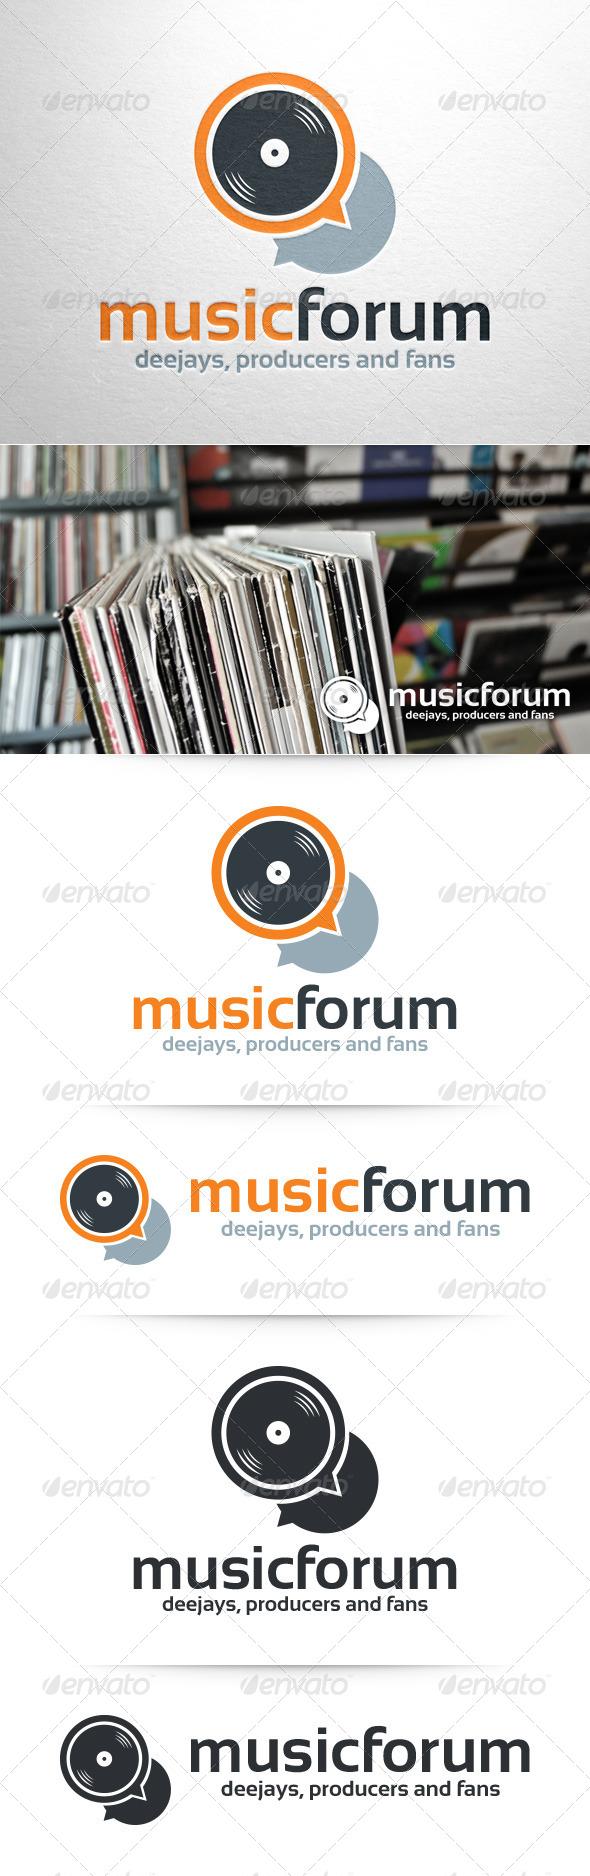 Music Forum Logo Template